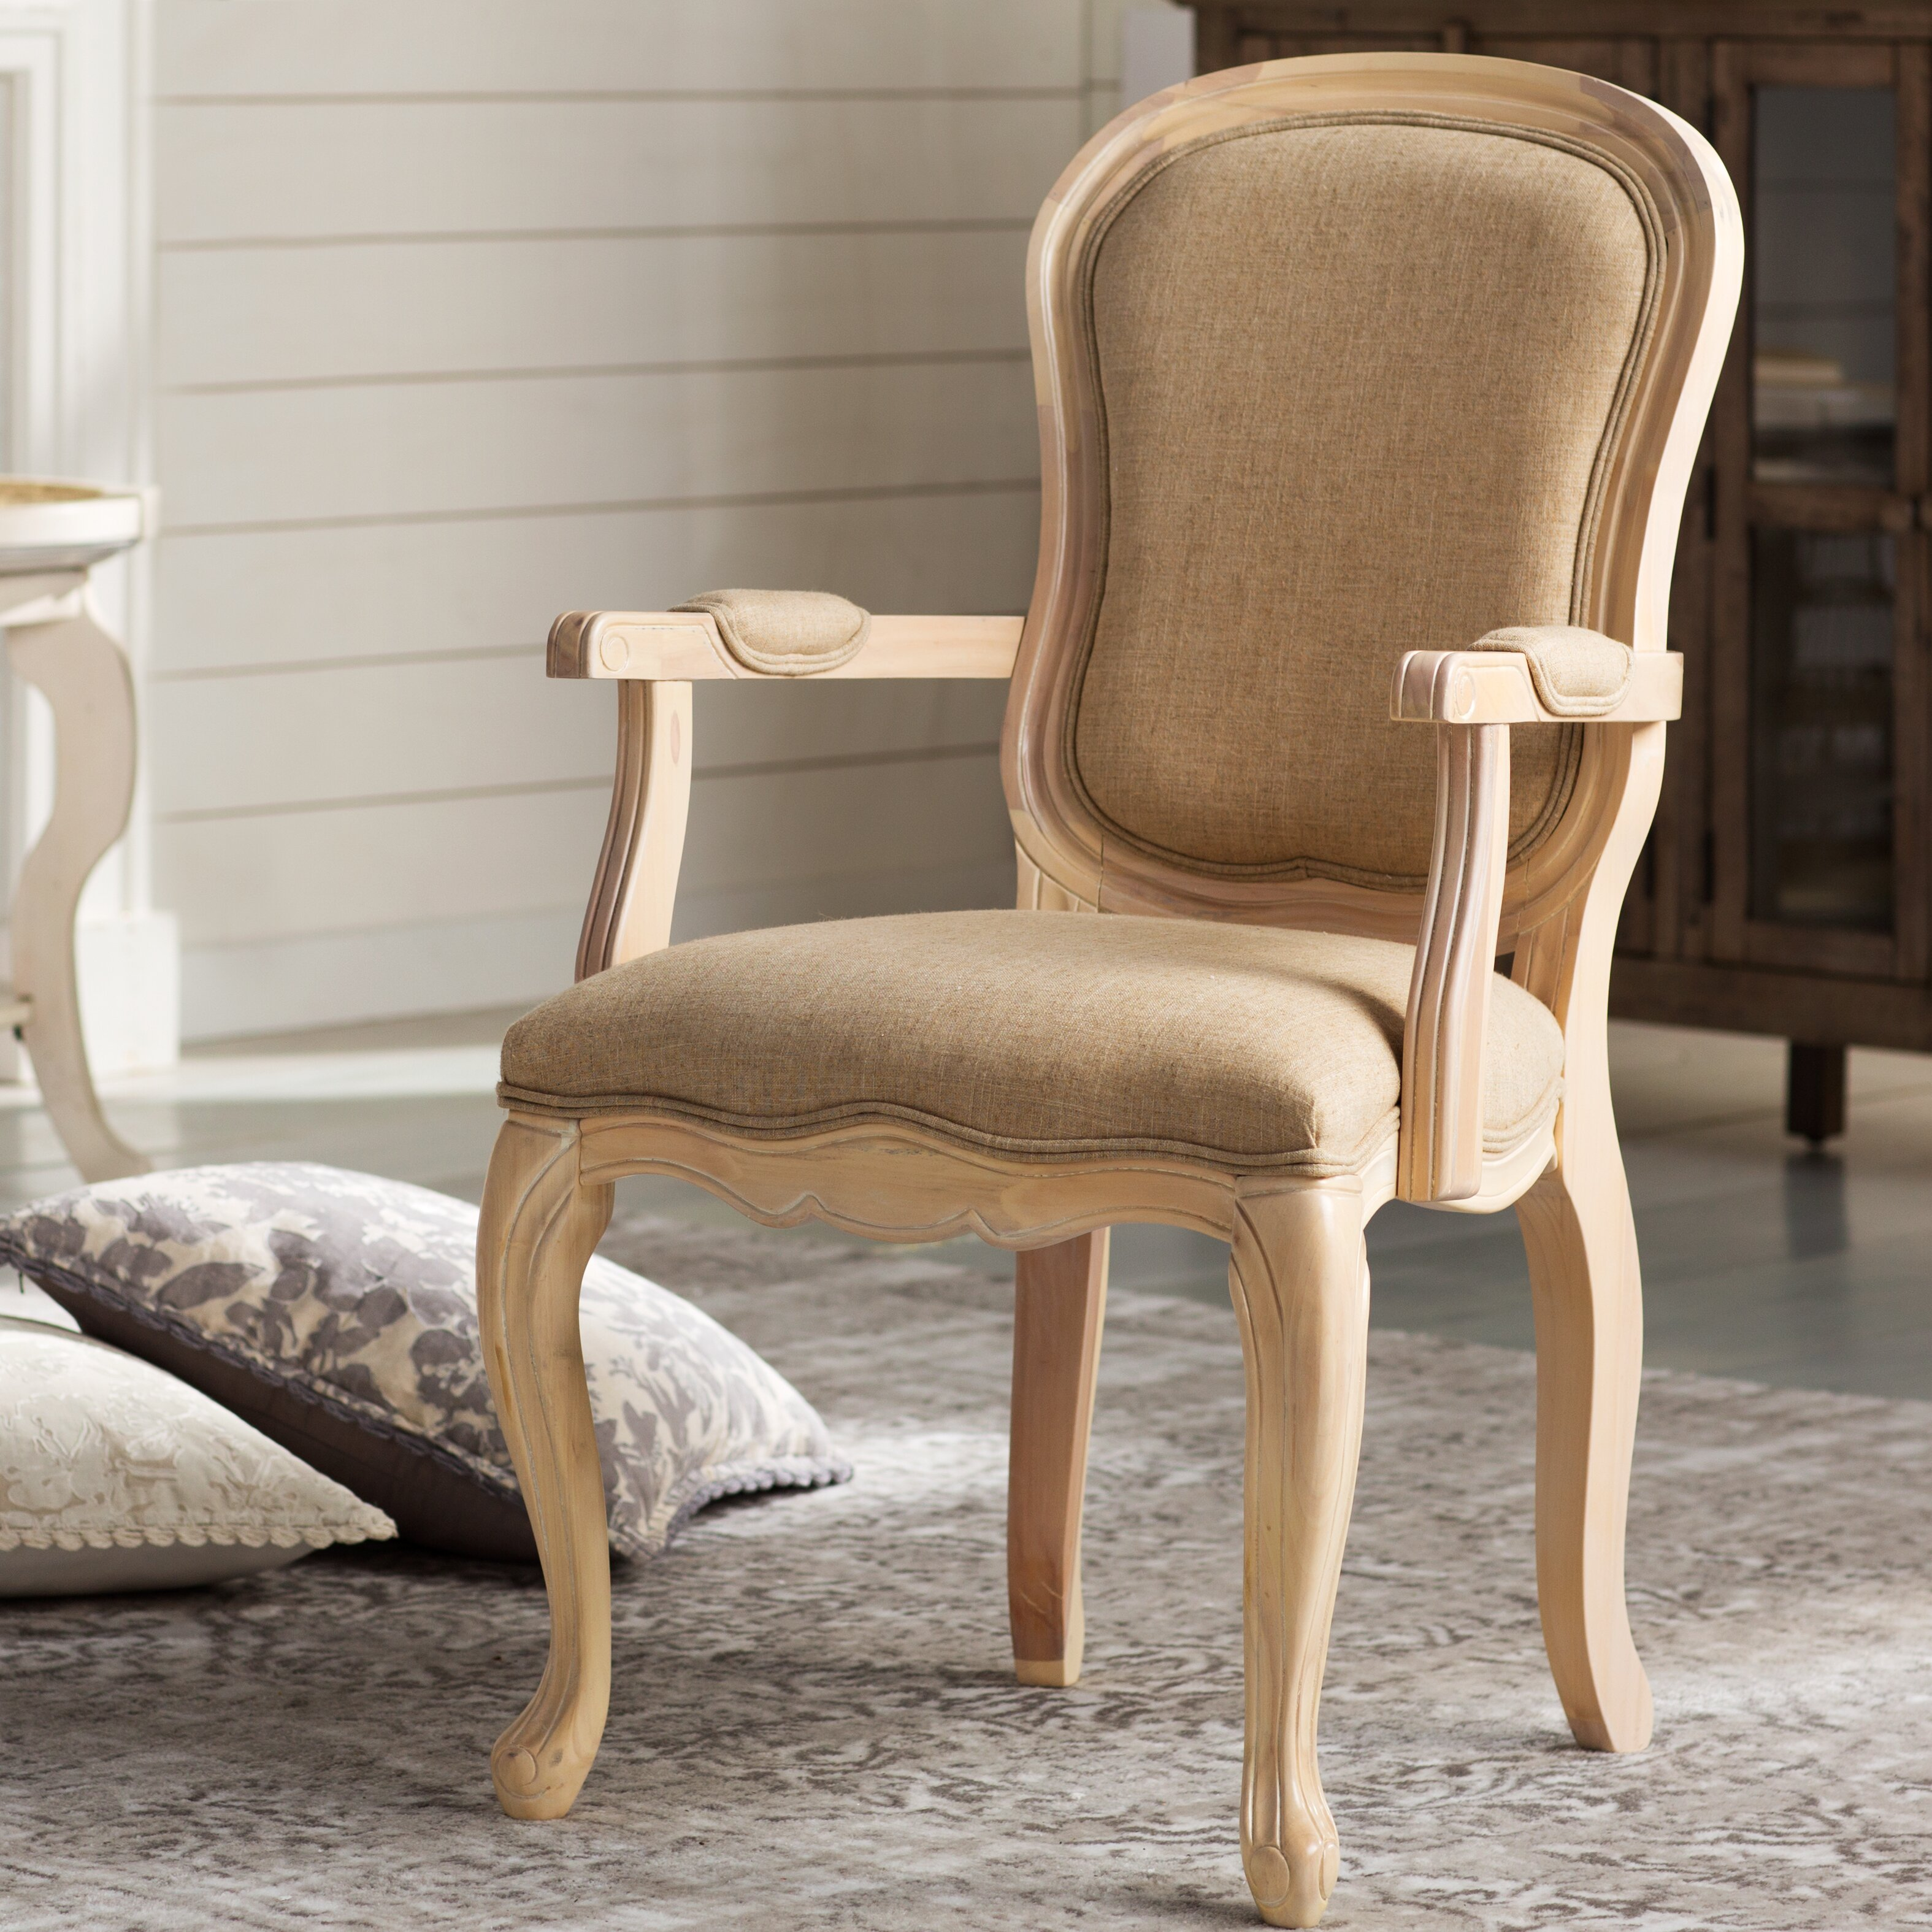 Lark manor saint quentin accent arm chair amp reviews wayfair